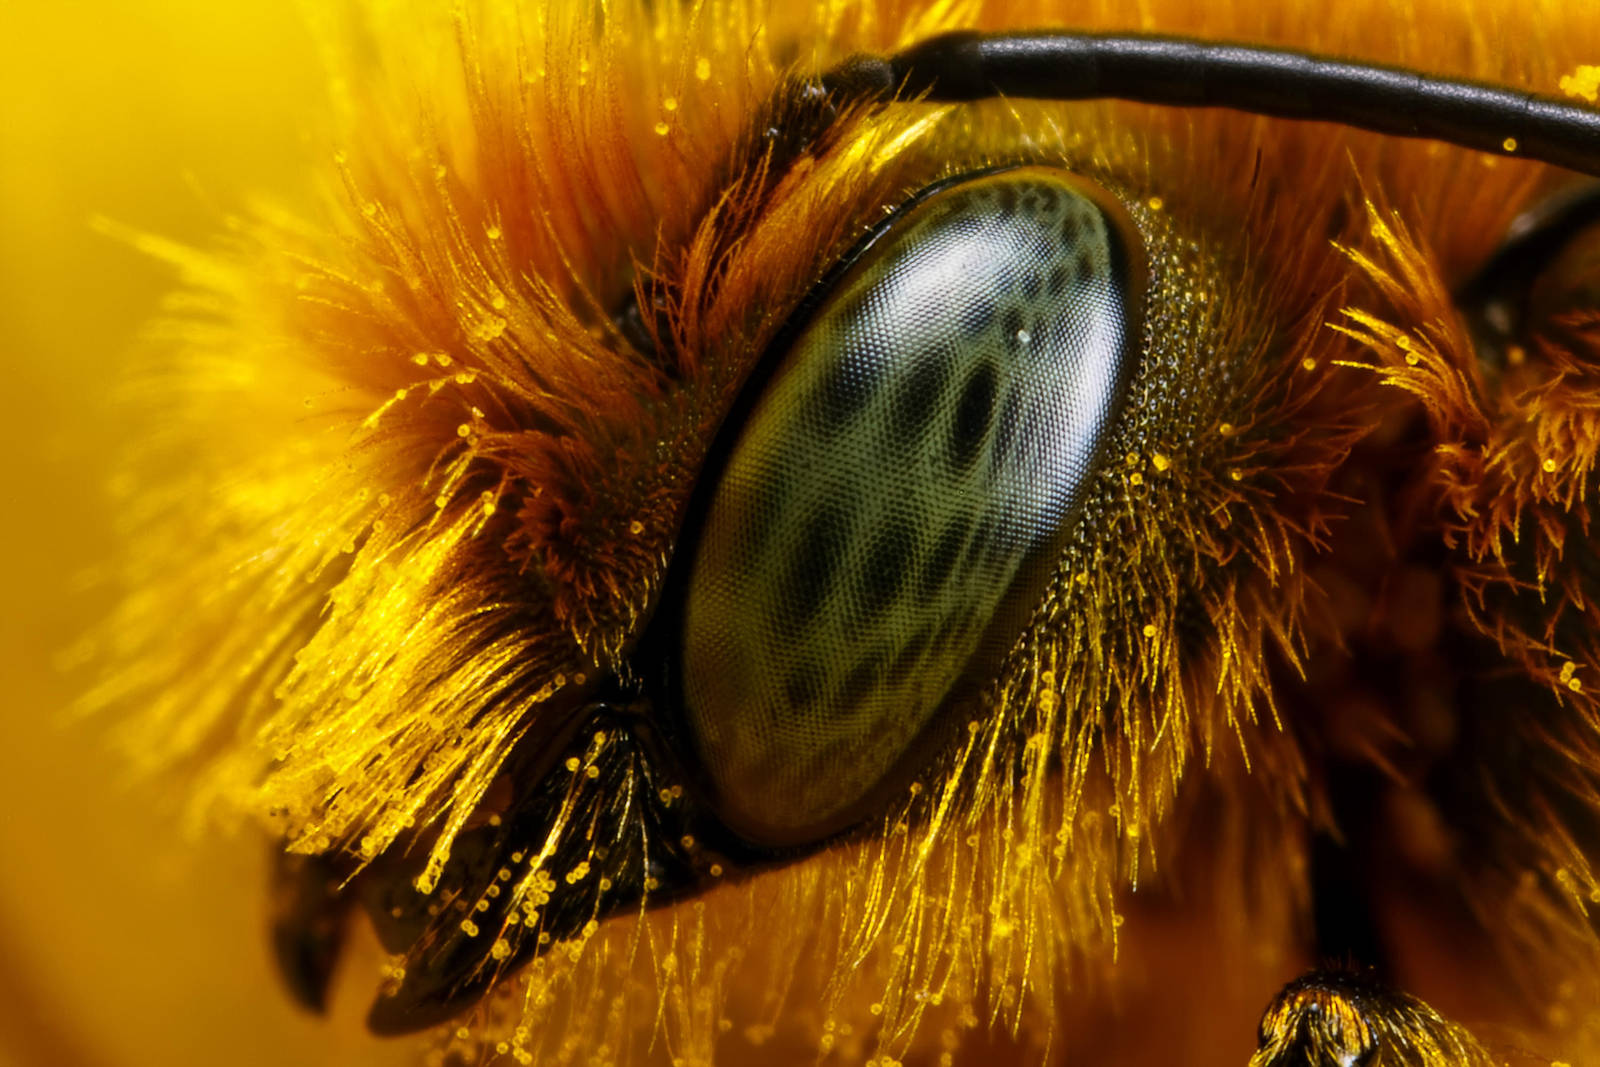 Miner Bee at 5x by dalantech